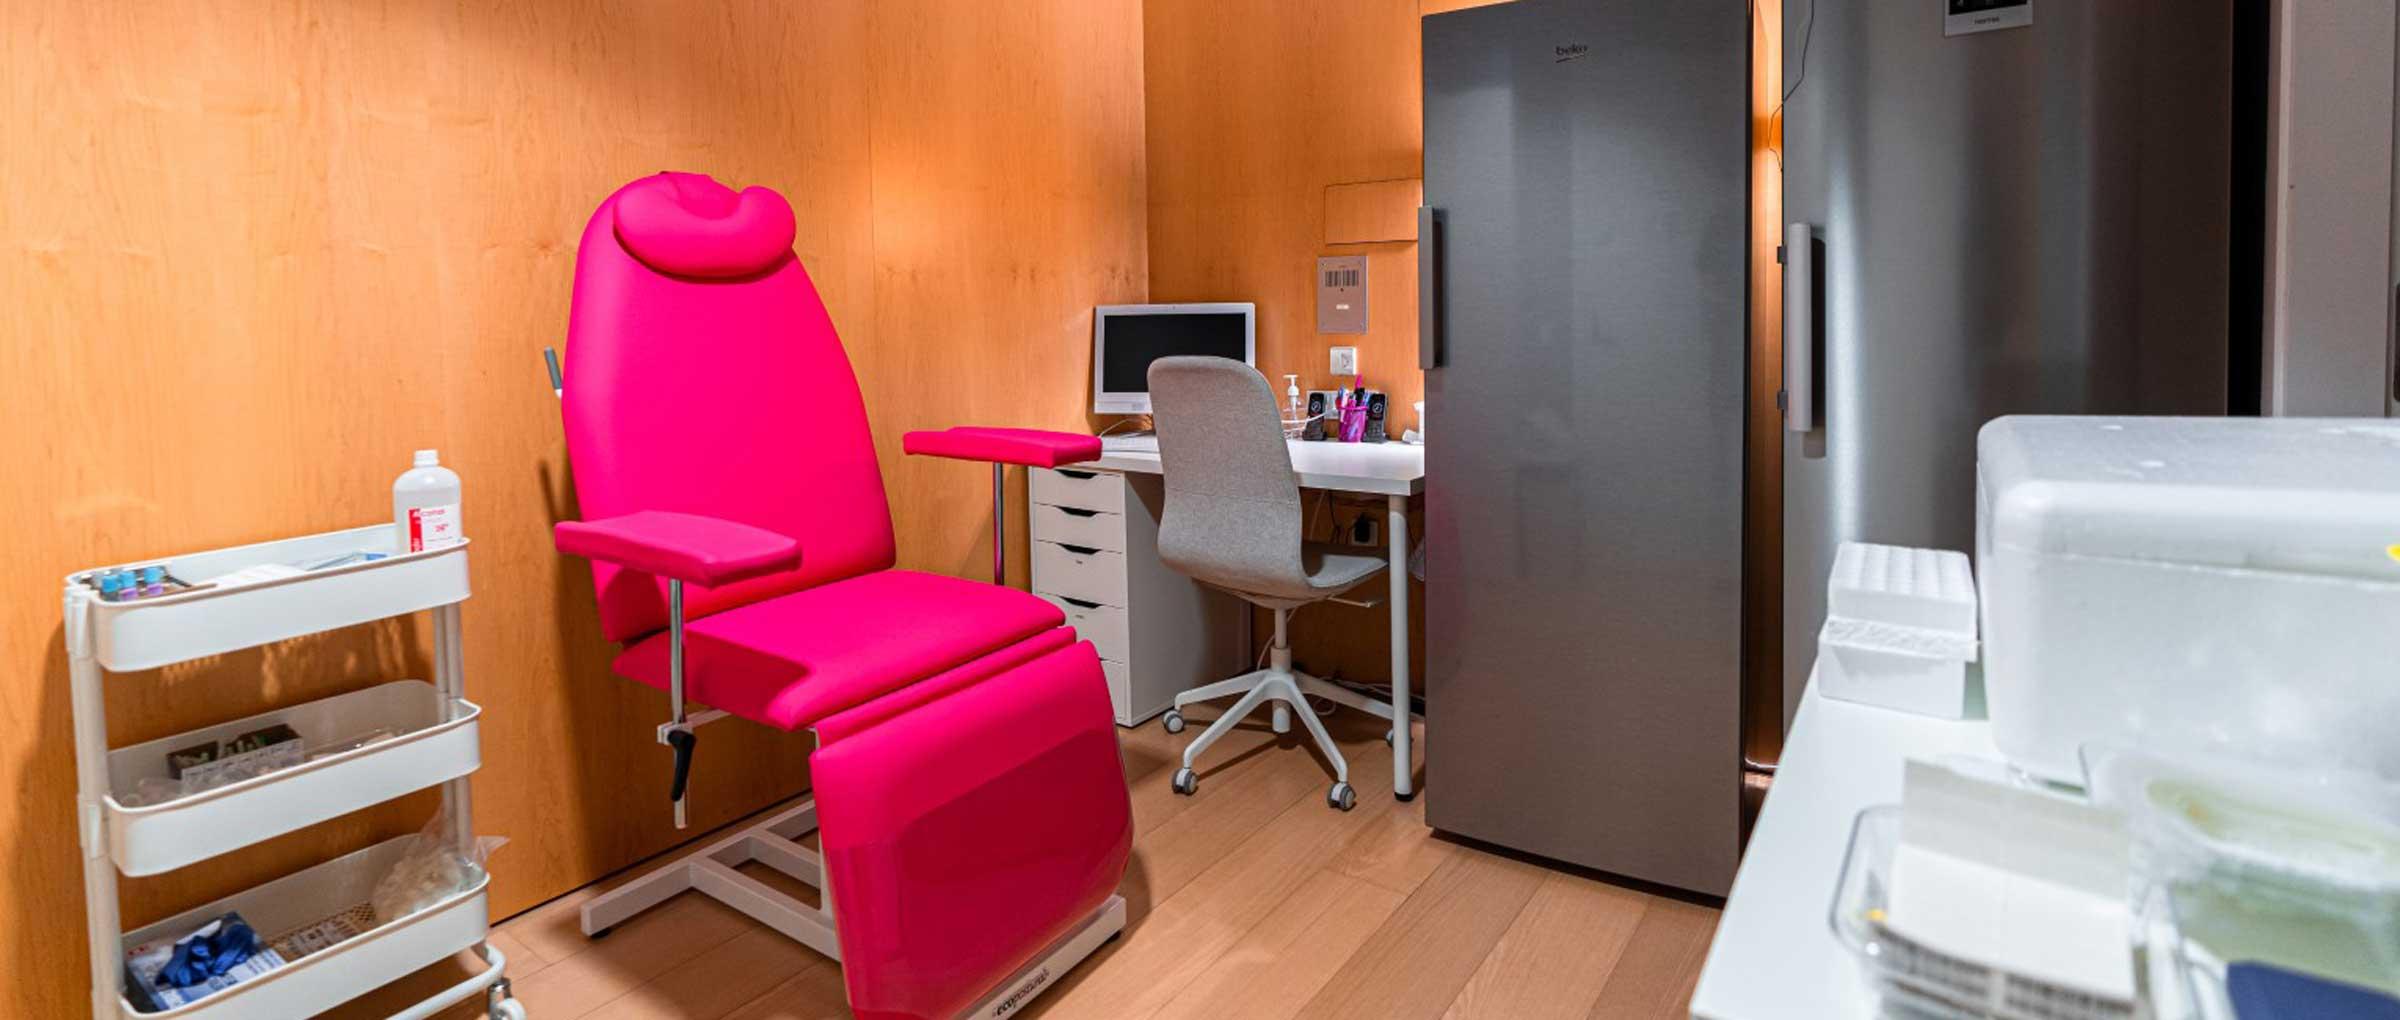 Sala de enfermería de Ovoclinic Madrid